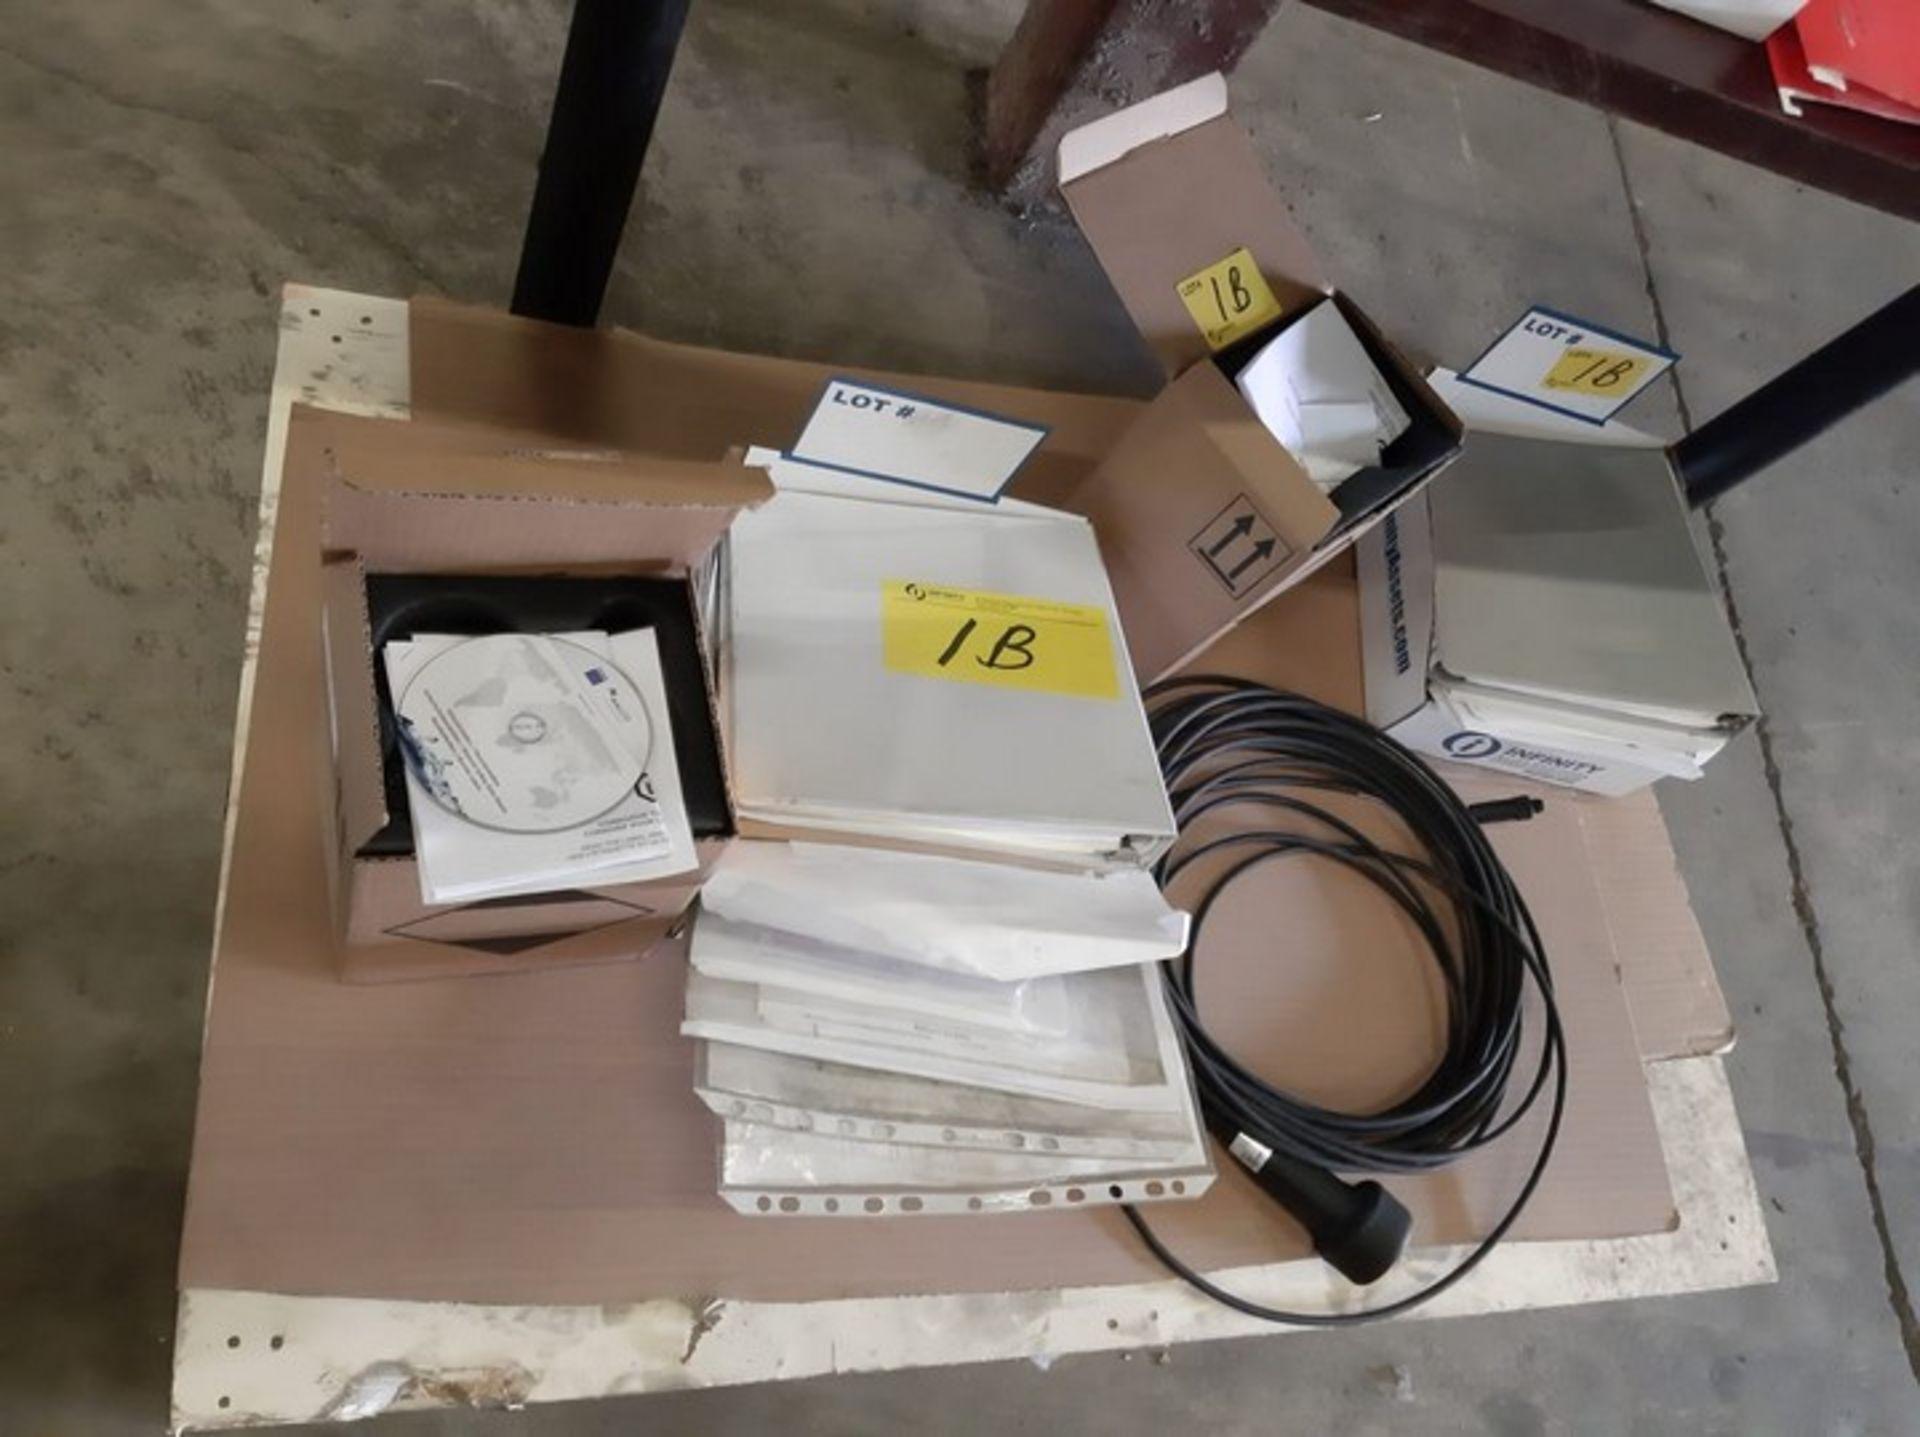 "2006 TRUMPF TRUMATIC L 2510 CNC LASER, 2,000 WATT, 4' X 10' TABLE, TRAVELS: X-120"", Y-50"", Z- - Image 31 of 32"